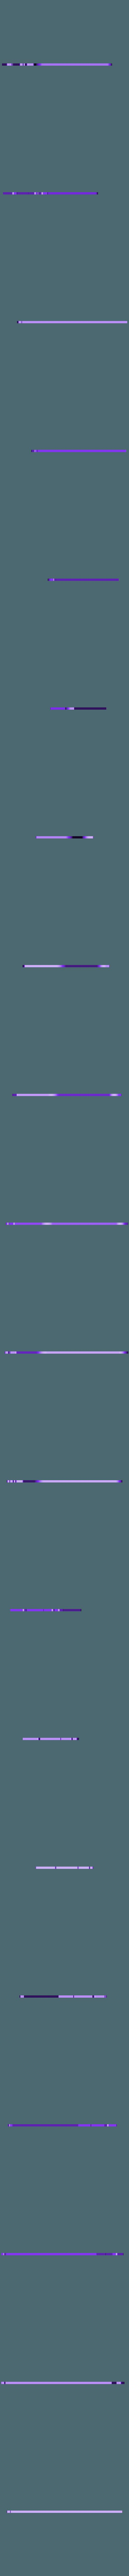 Escuadra_14_cm_v1.stl Download free STL file Shelf bracket set for single track slot • 3D printer design, dancingchicken